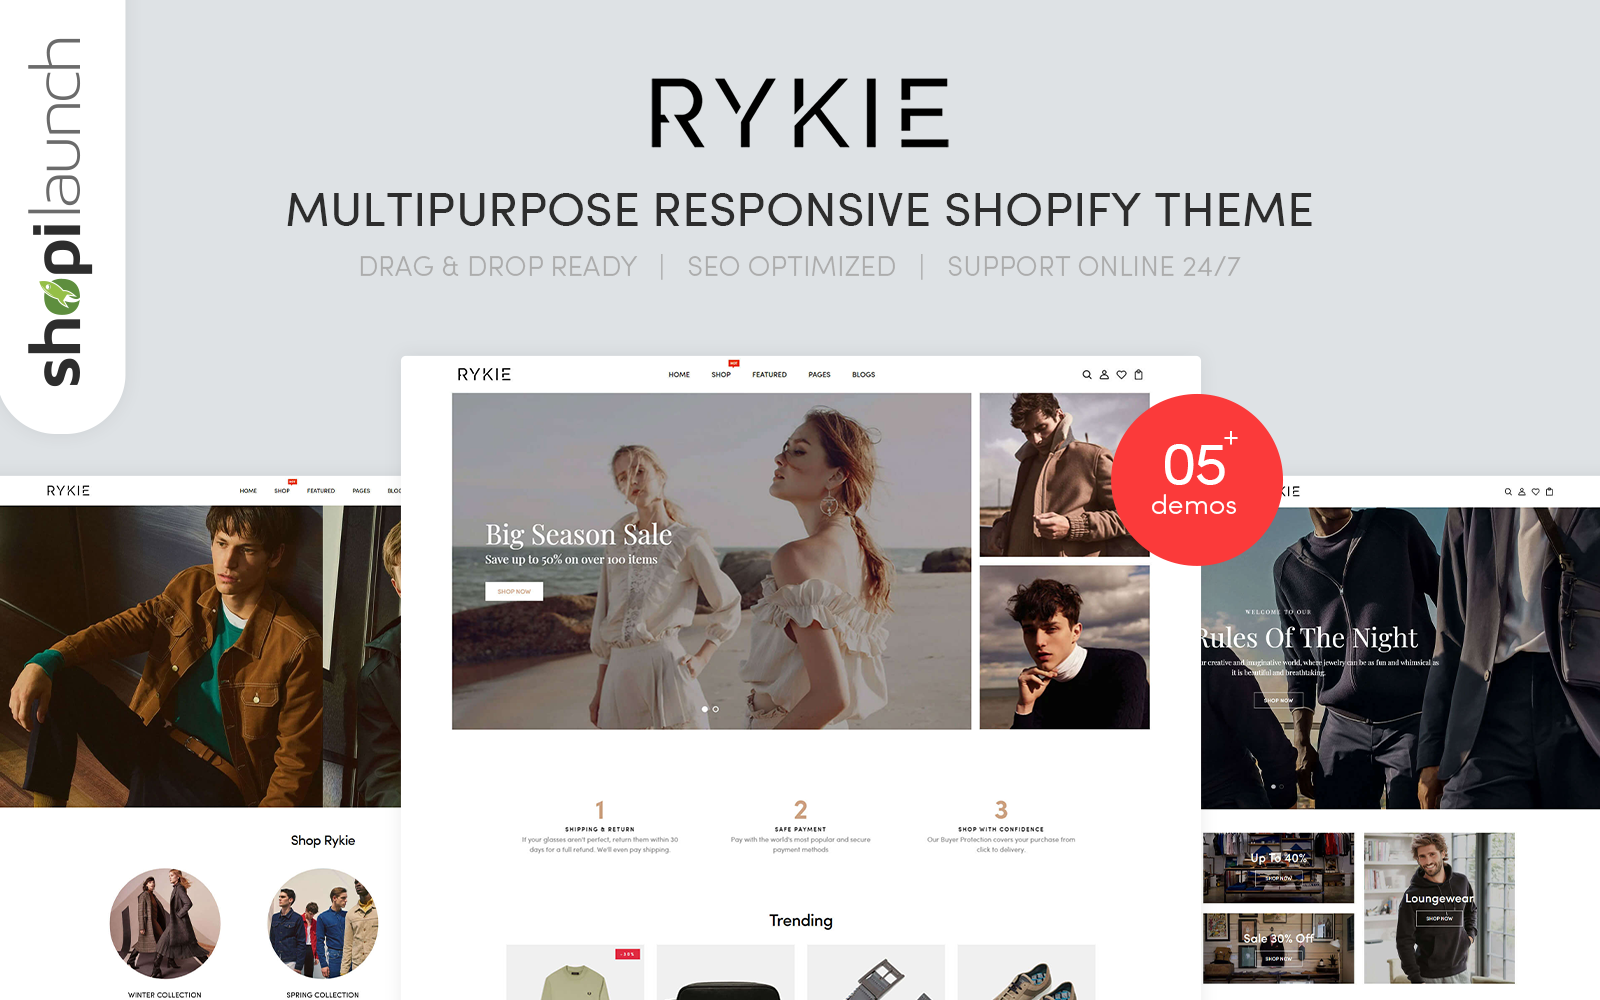 Rykie - Multipurpose Responsive Shopify Theme